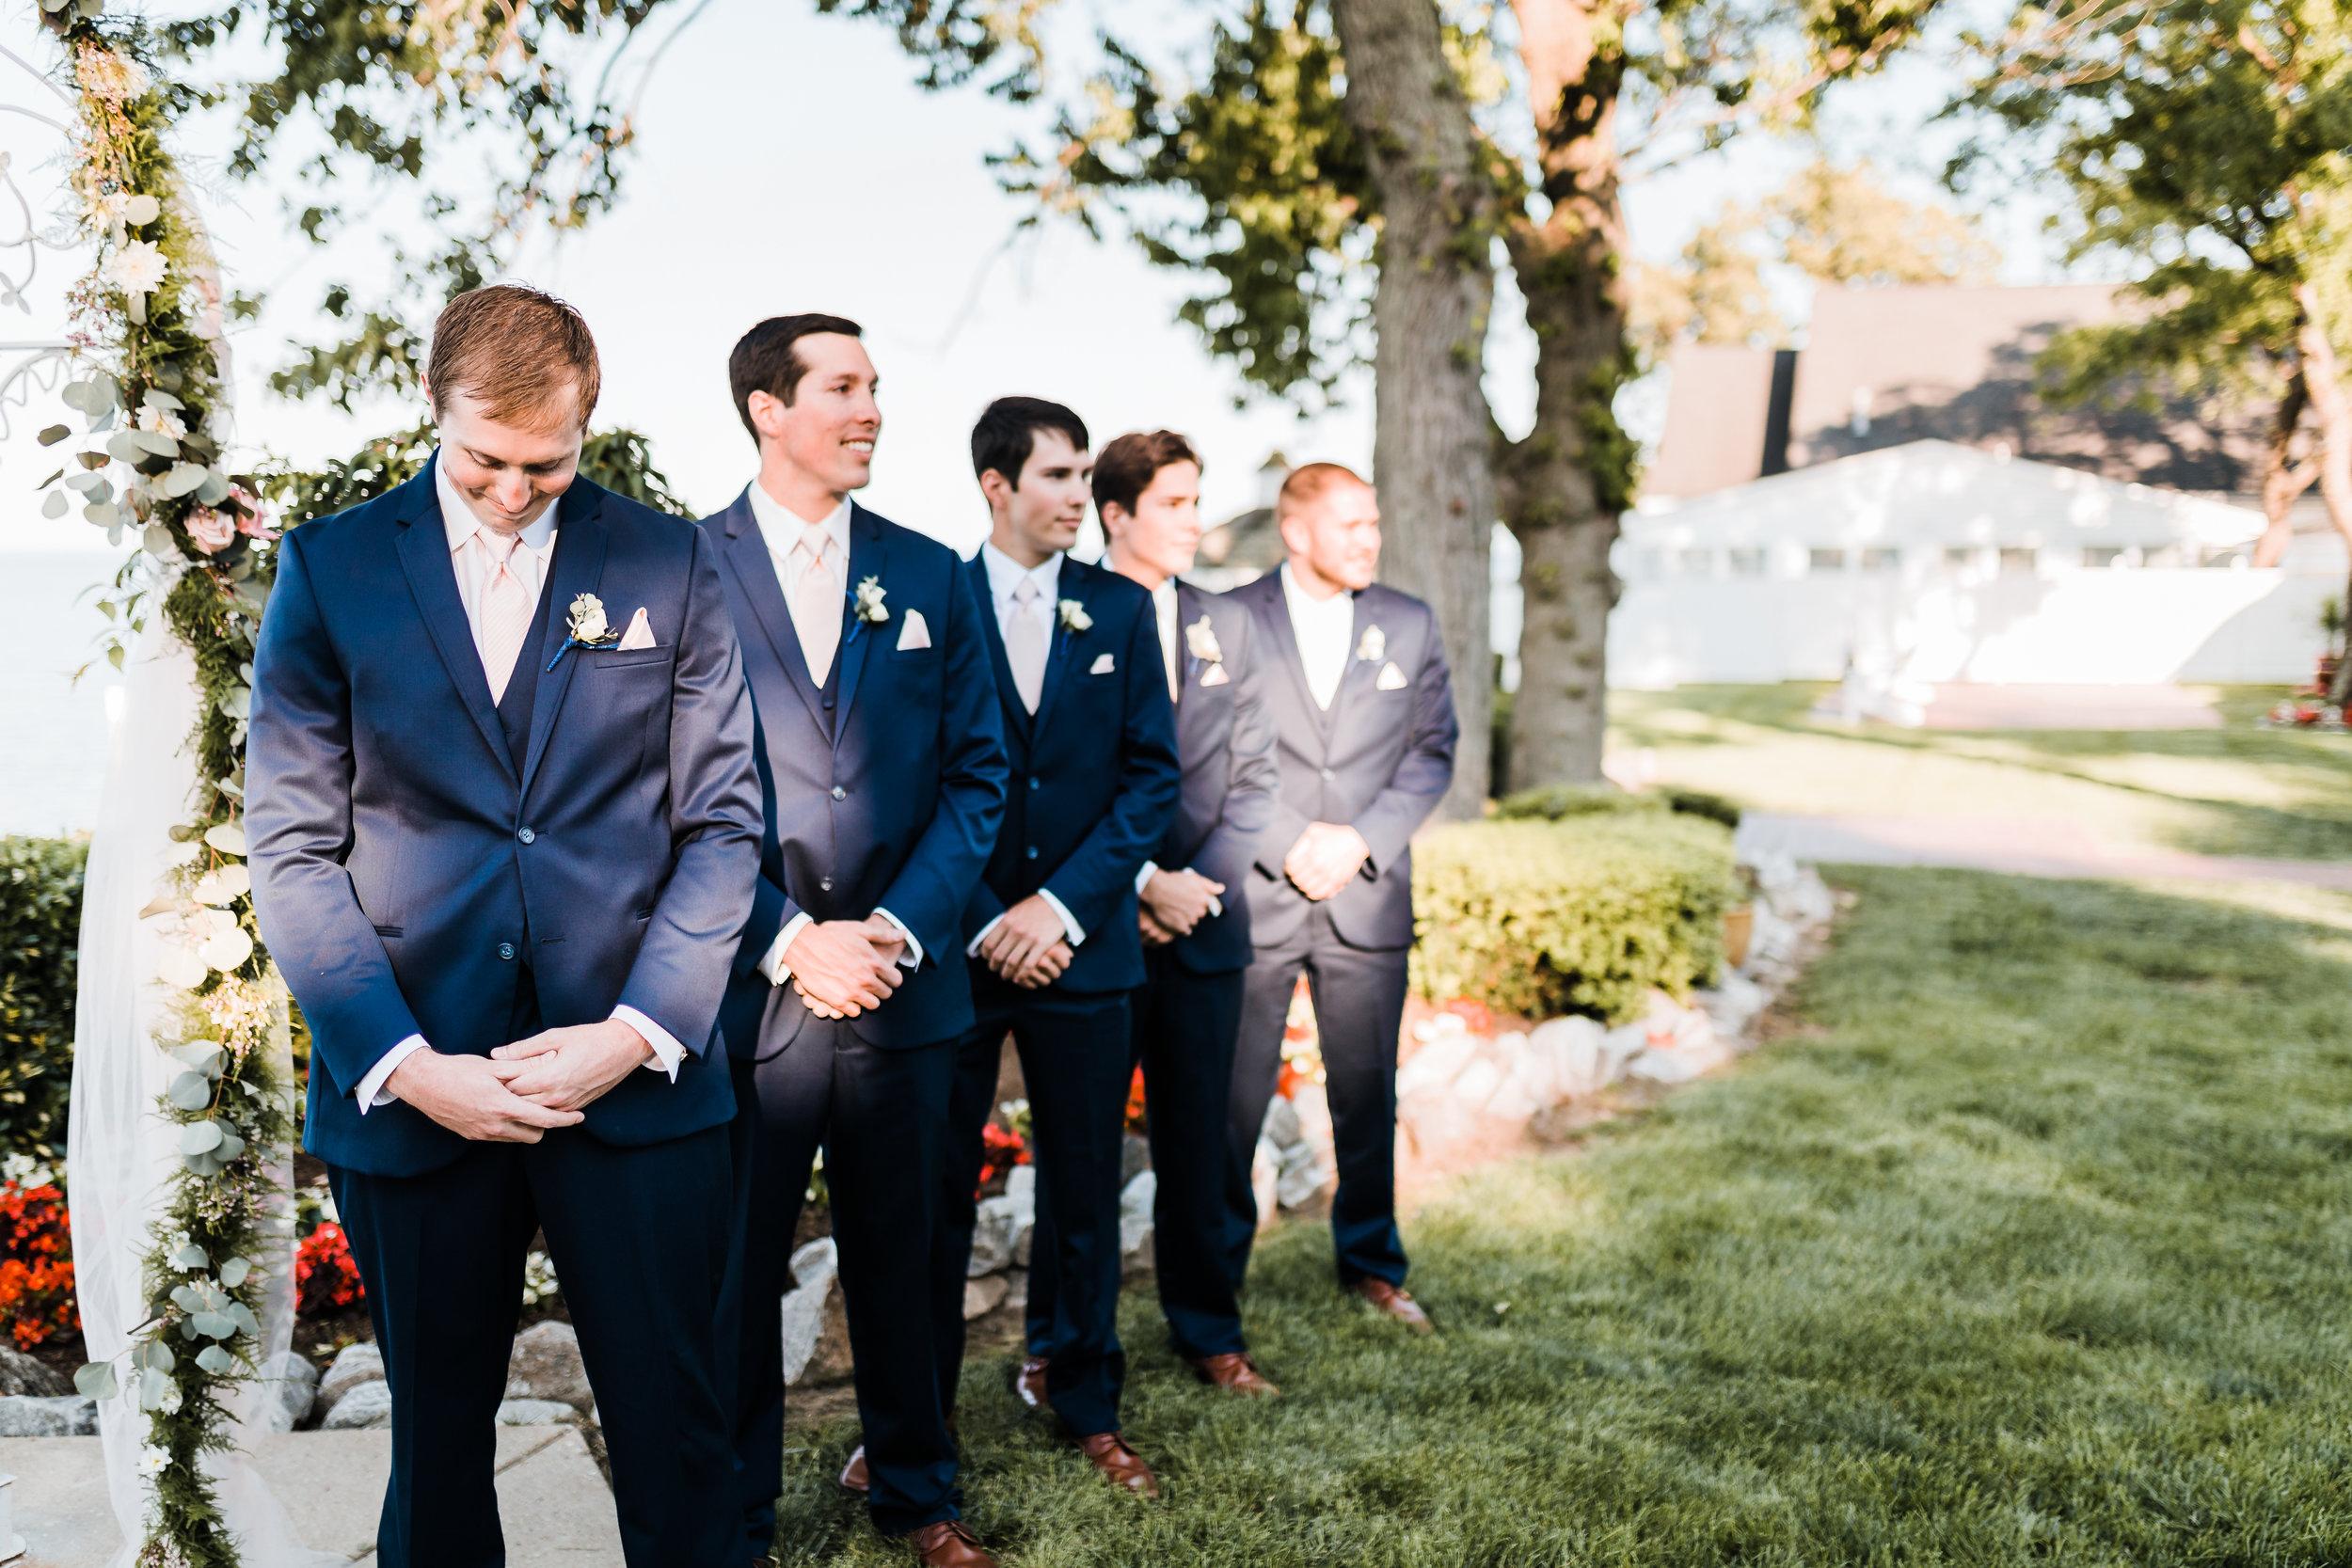 groom sees his bride walking down the aisle - groom reaction - pasadena maryland wedding photographer